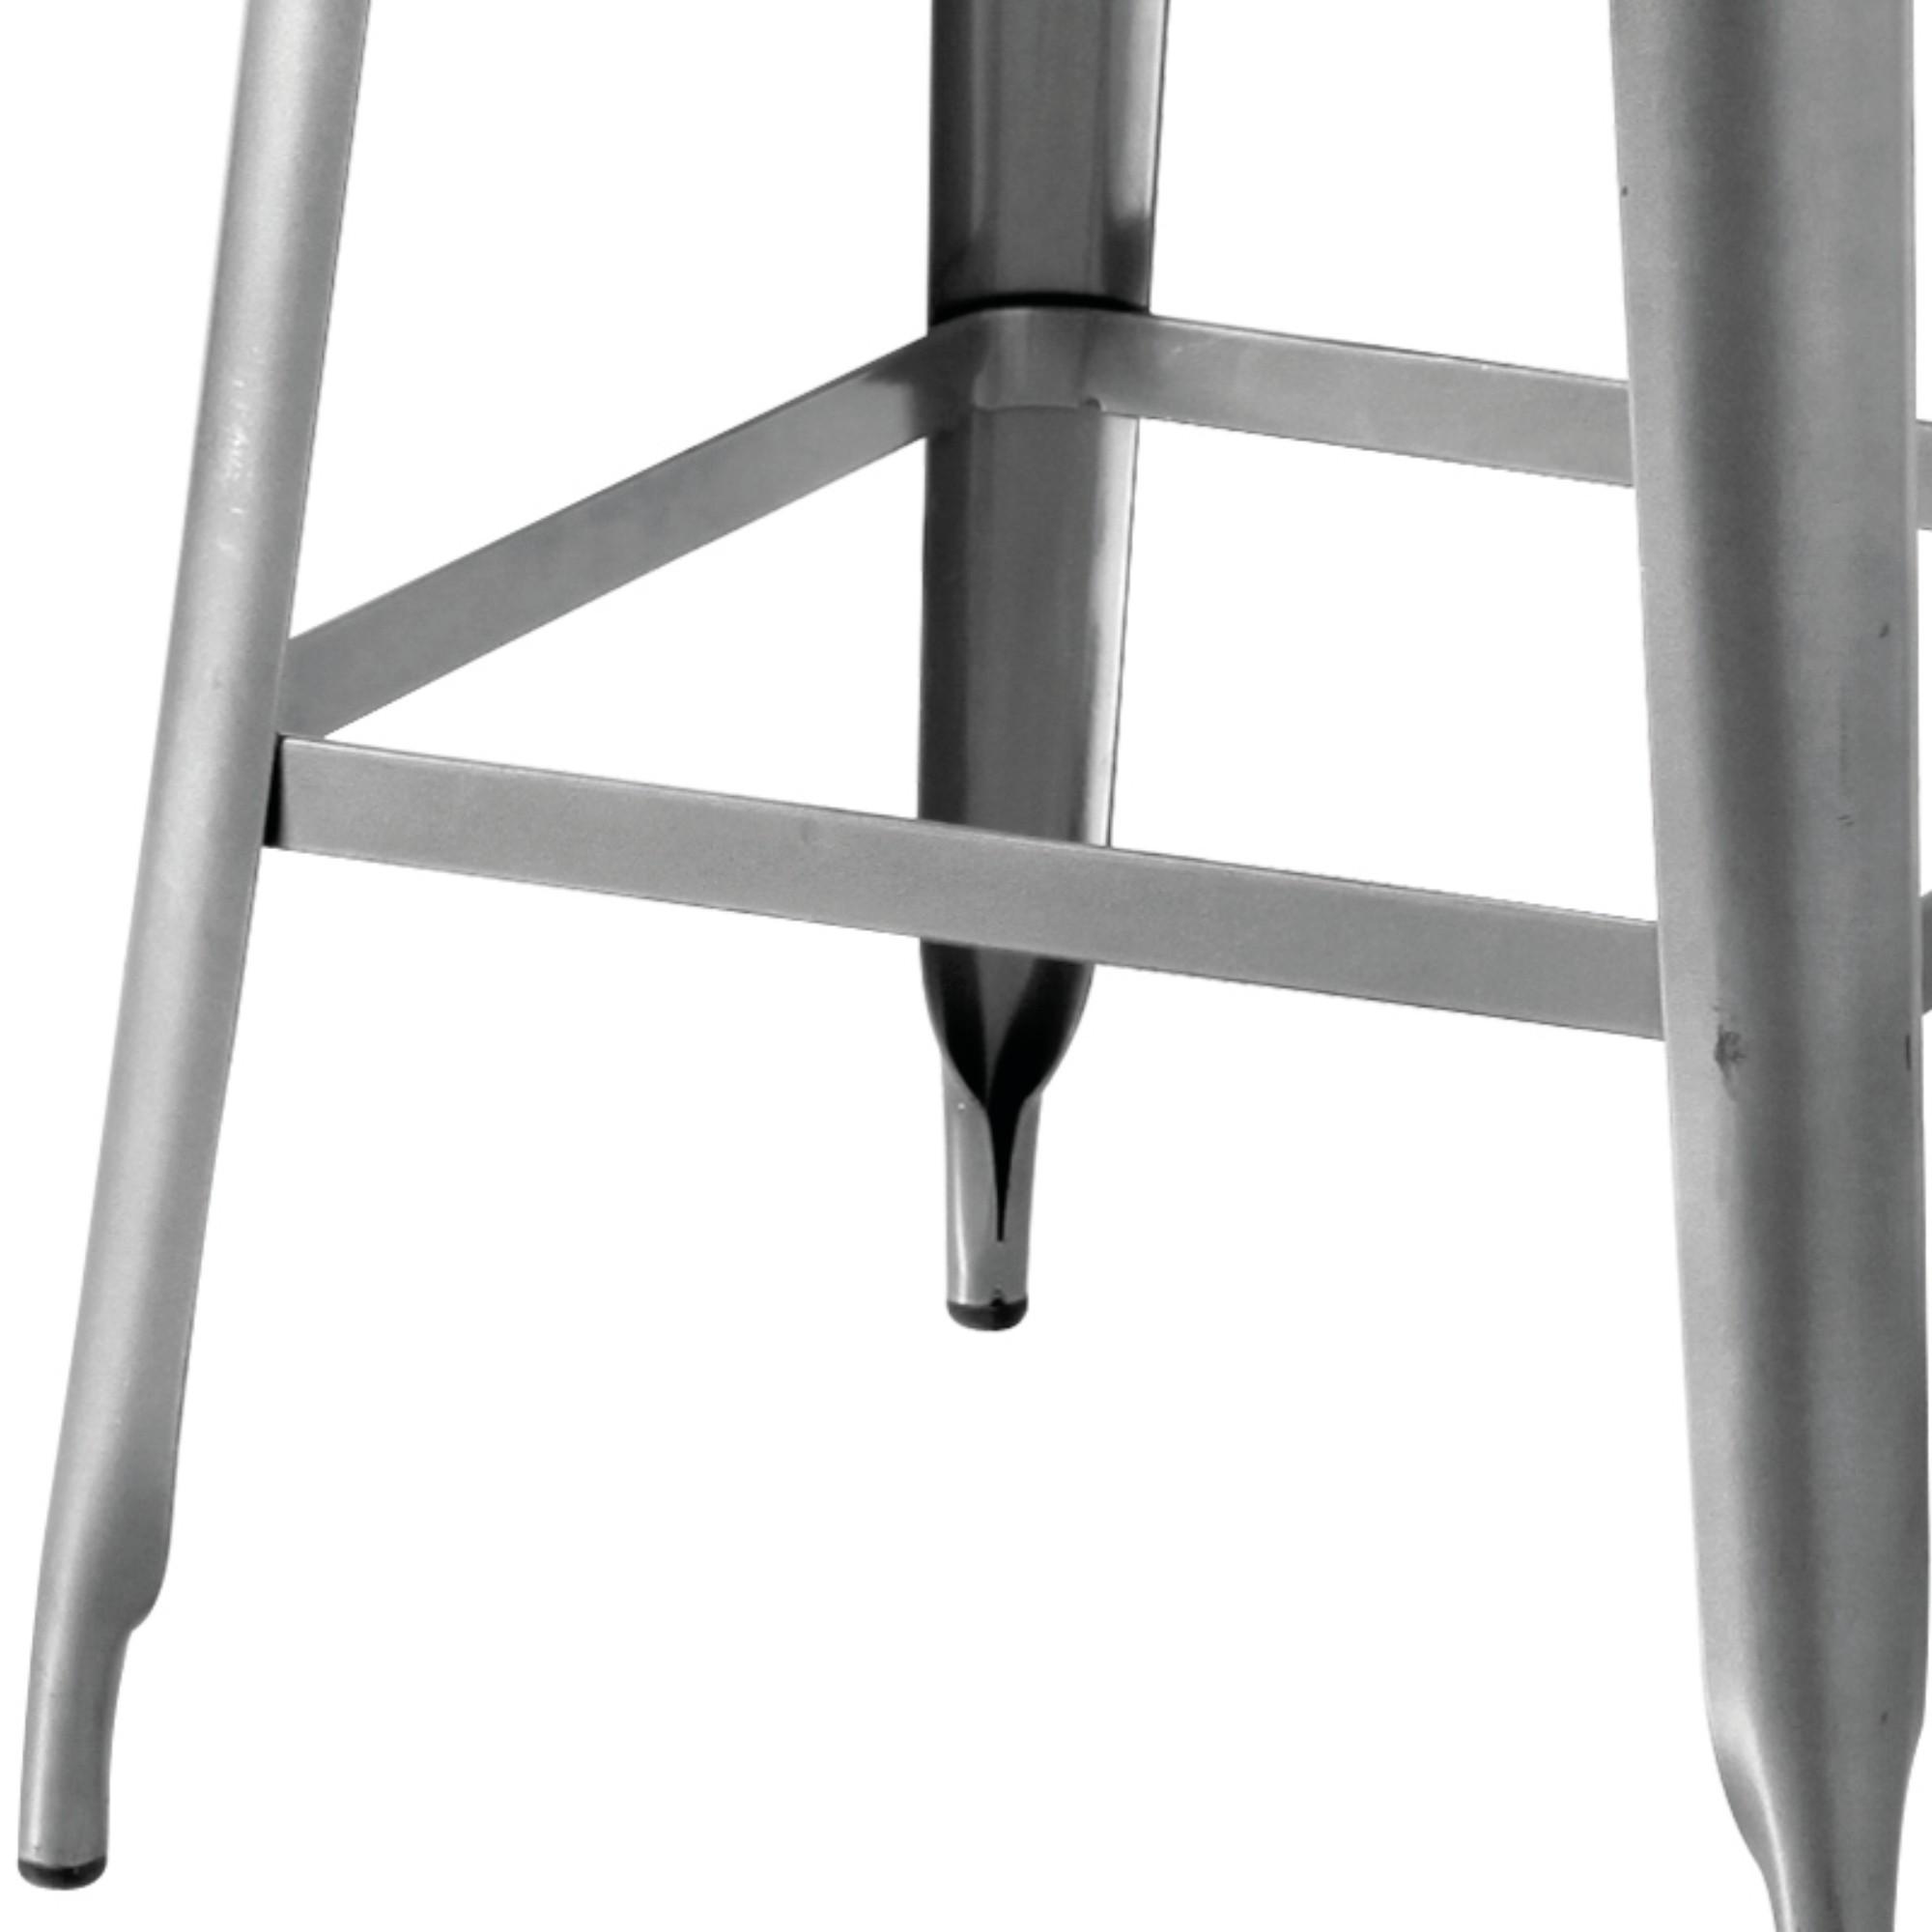 Sconto Barová stolička IRON železo almond/hnedý kožený poťah.